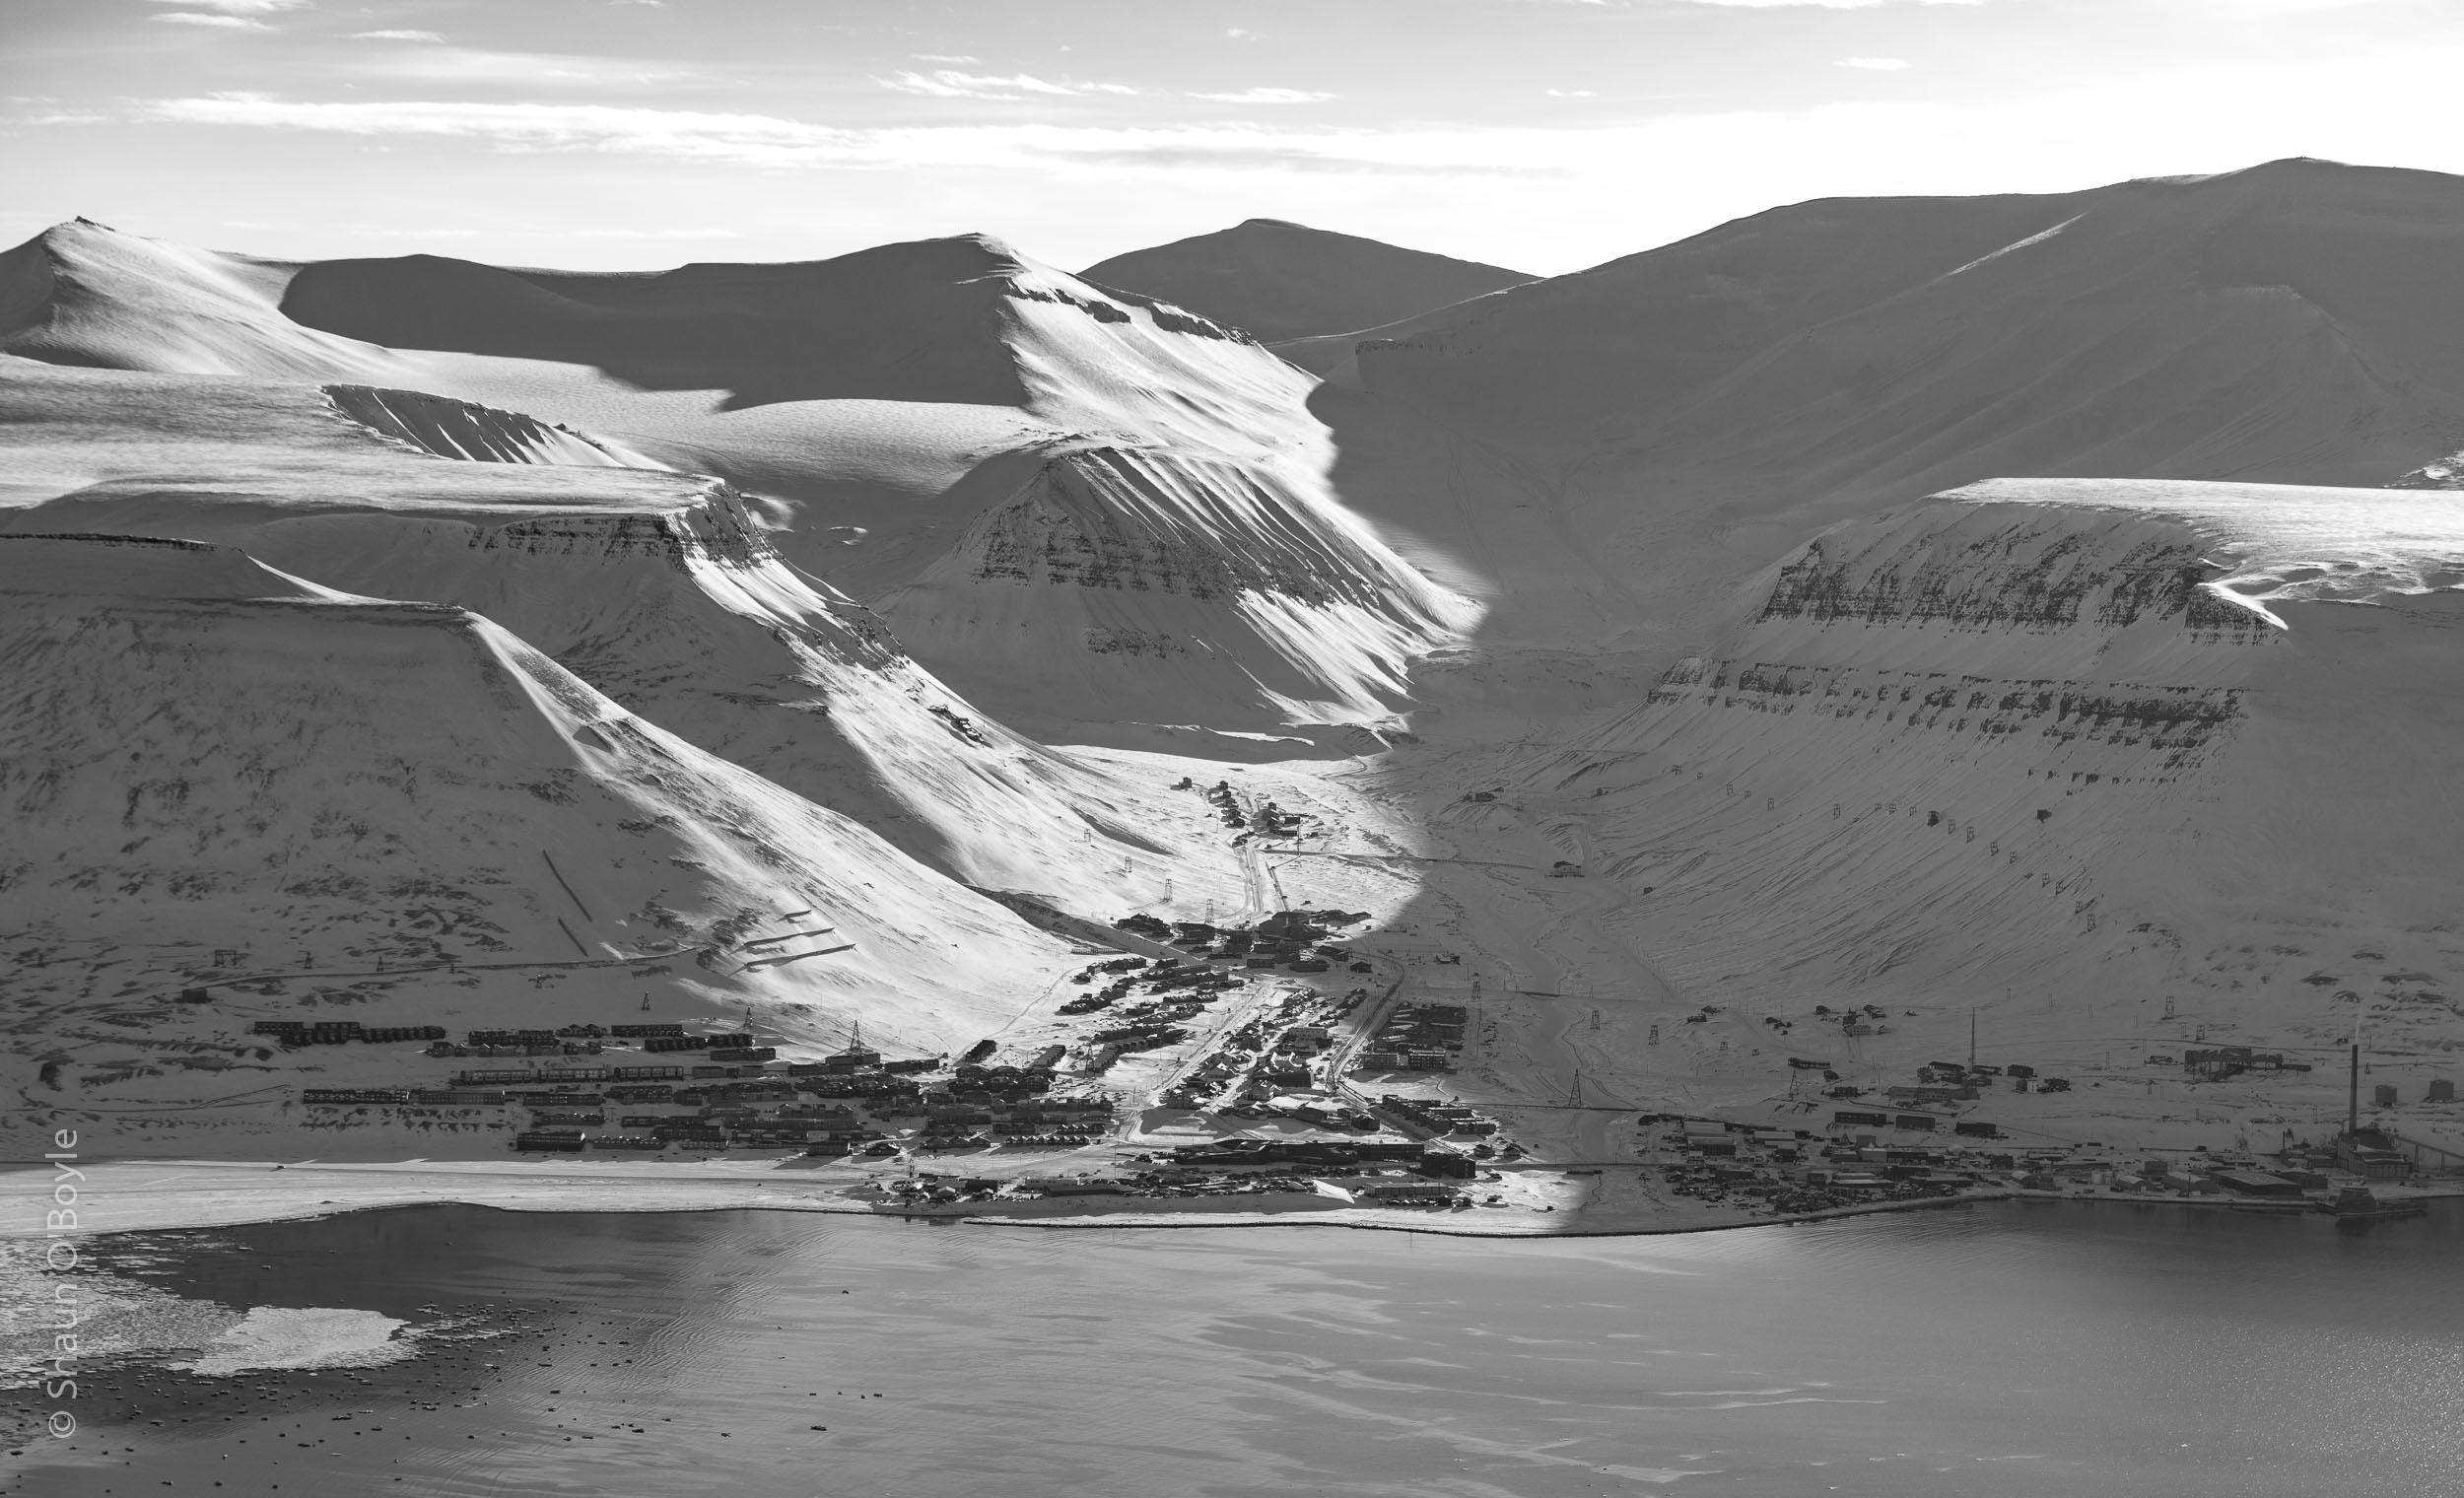 Longyearbyen, Svalbard's largest settlement, from Hiorthfjellet